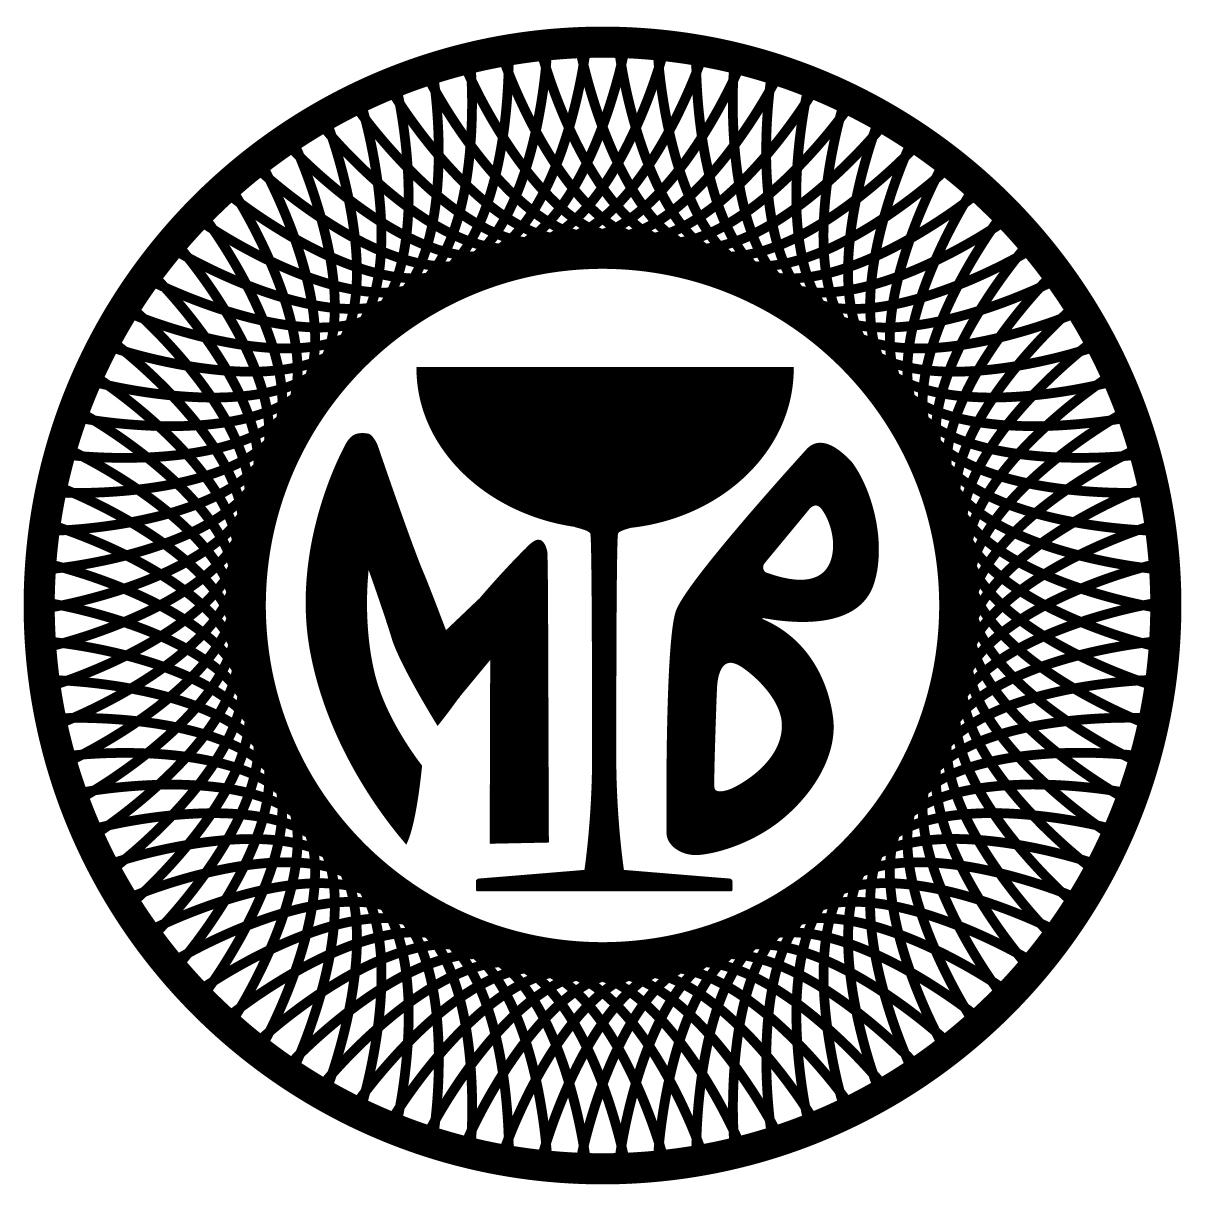 Copy of 2018 NY Bev Logo - Middle Branch.jpg